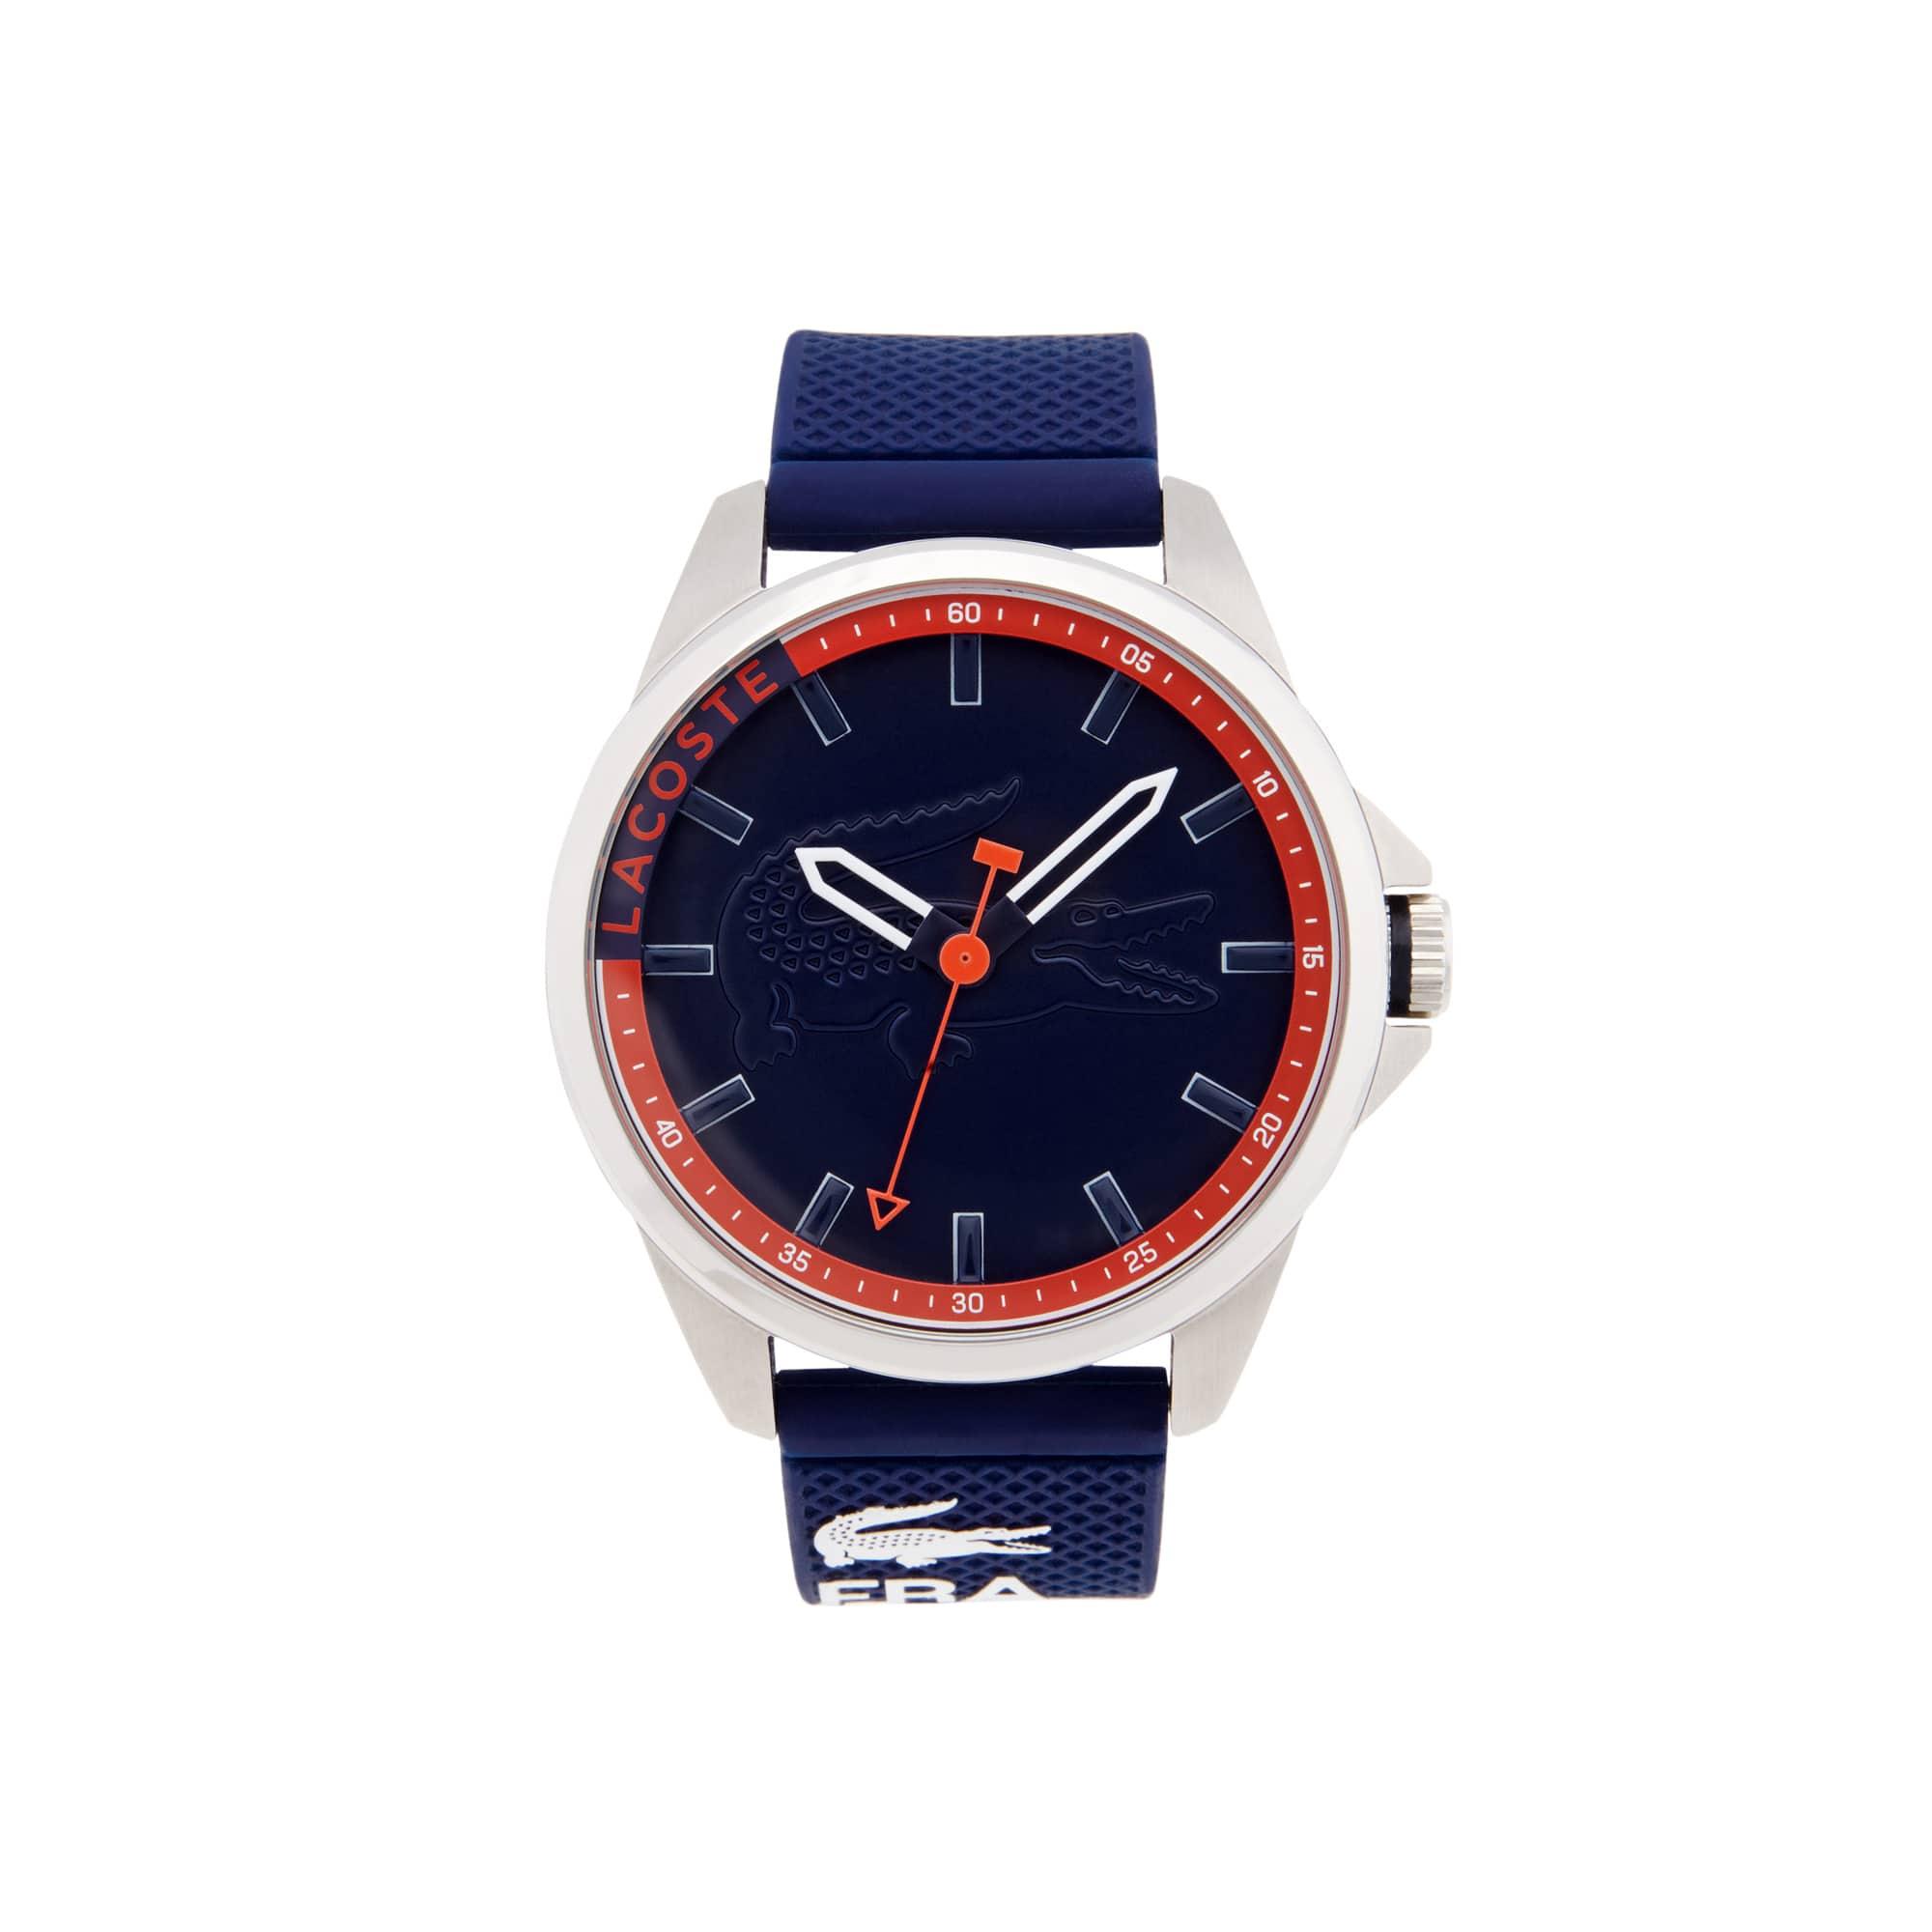 Montre Capbreton Homme avec Bracelet en Silicone Bleu